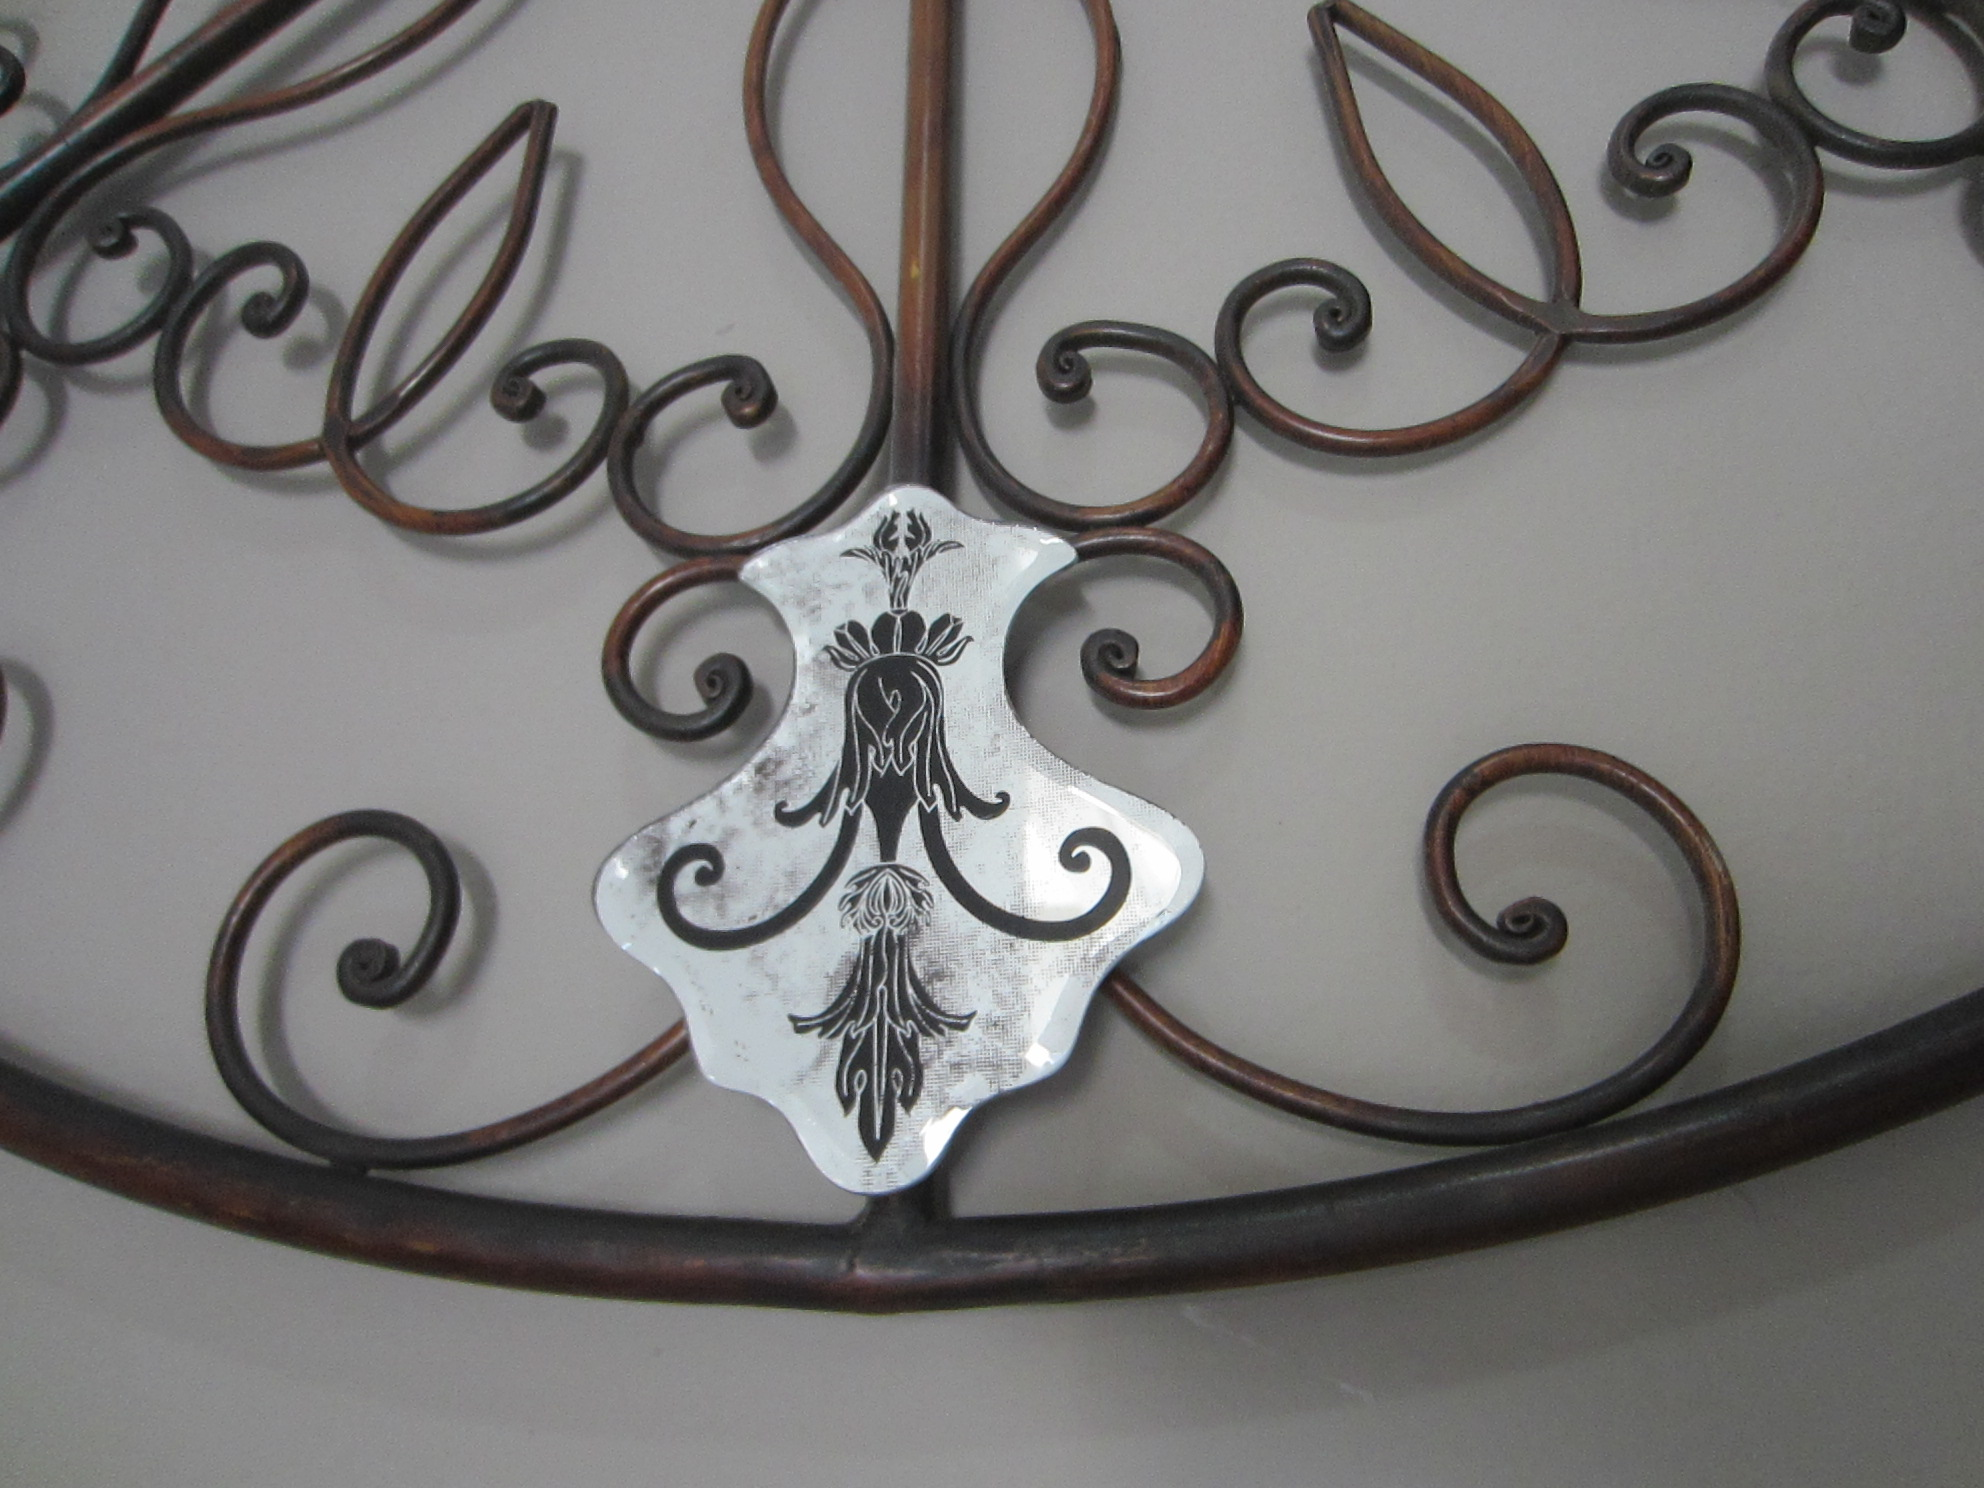 Round Black Wall Decor : Modernist mirrored round metal wall decor decorative black